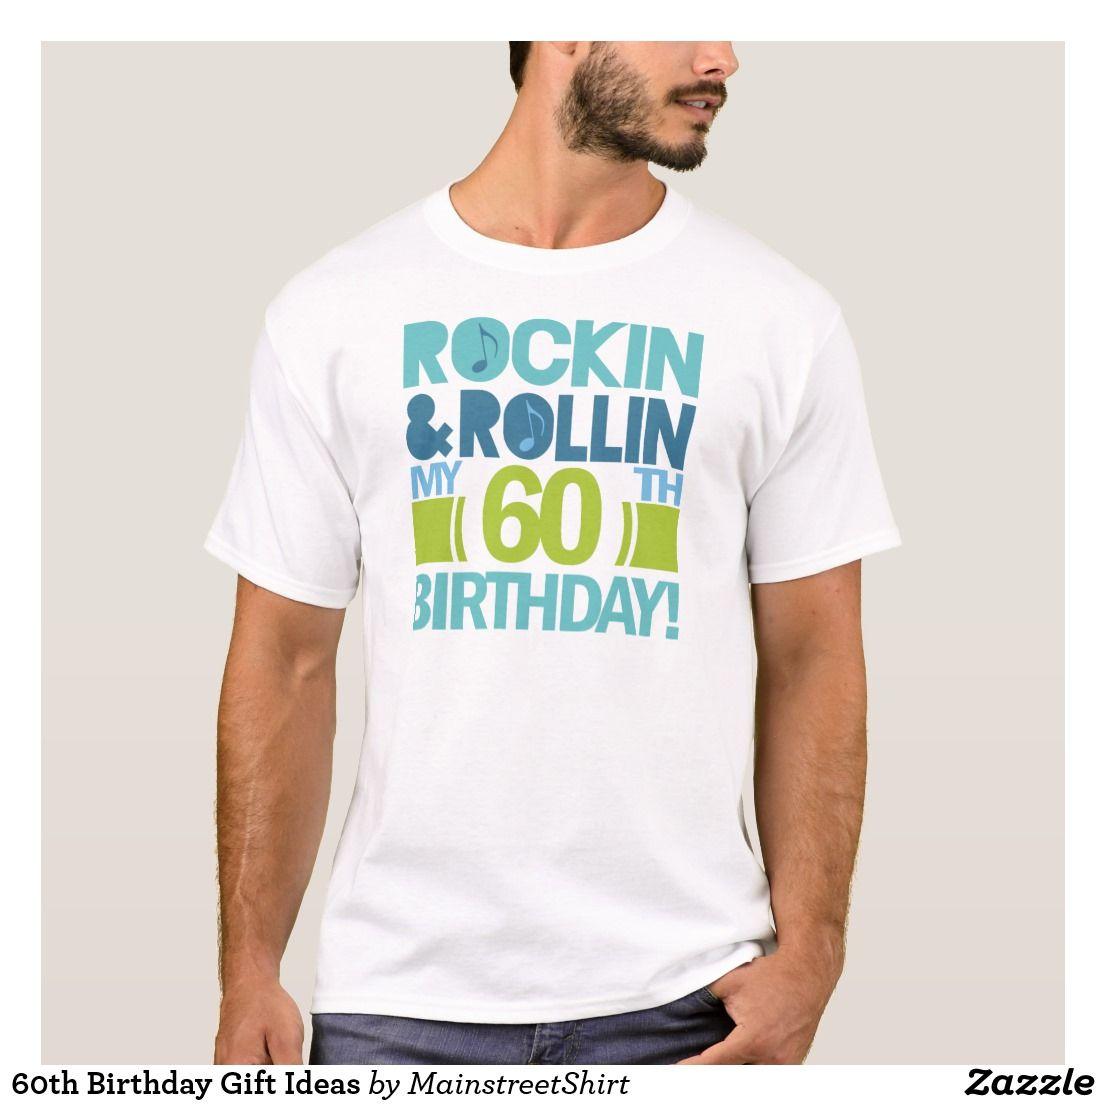 T Shirt Design For 60th Birthday